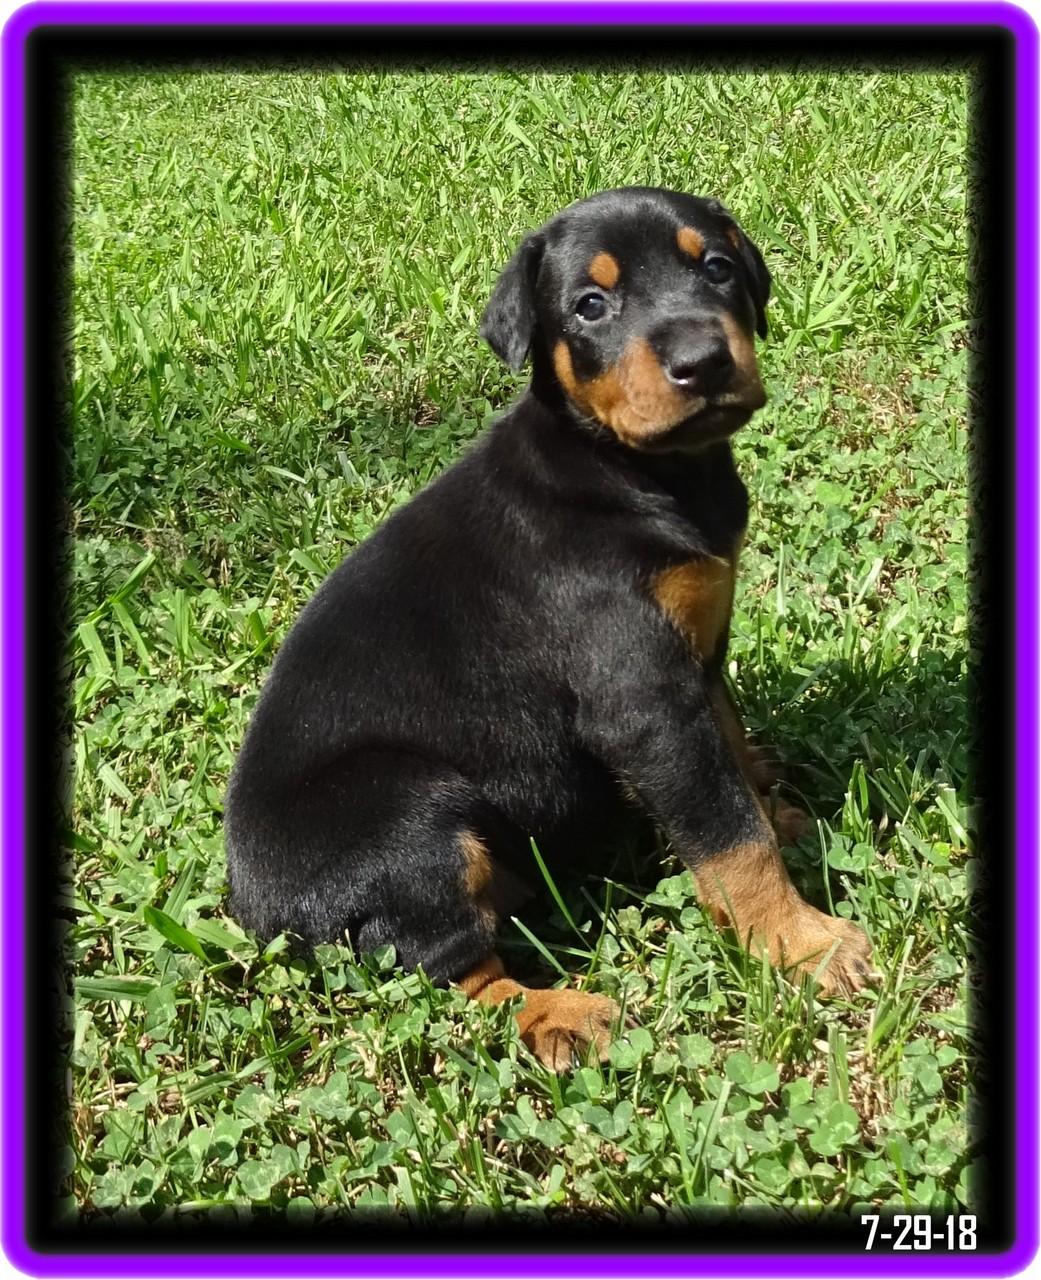 Minda - Star baby & Winston born  6-29-18  finished her Grand Victor Program now  in Charleston SC ... formally Hoytts Brillian Star BN CD CGC in GV program